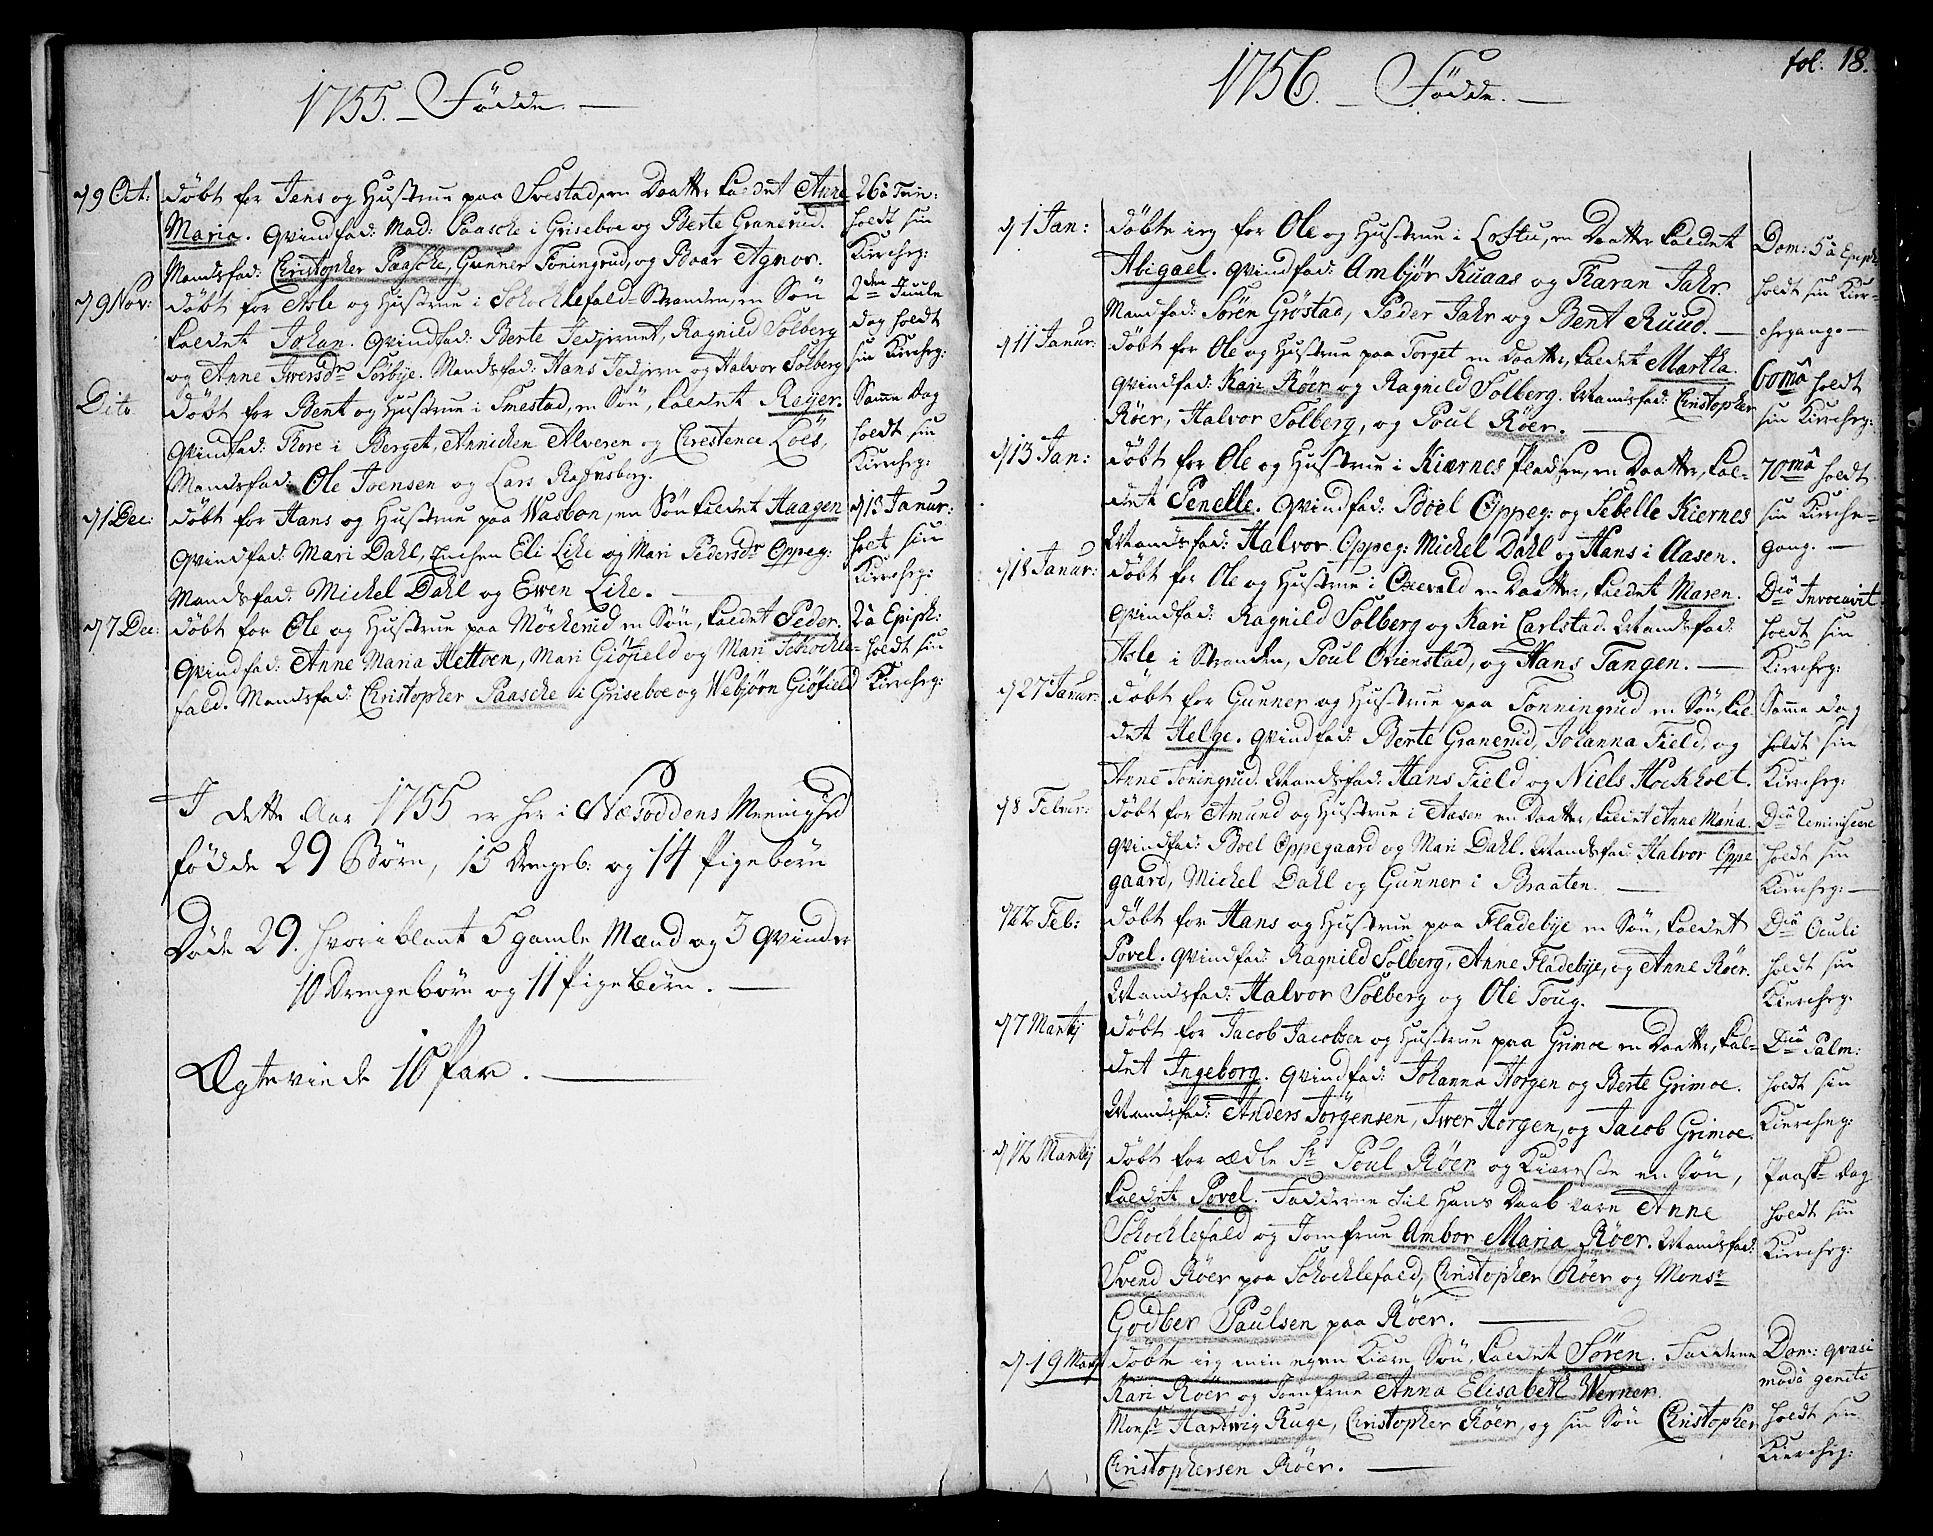 SAO, Nesodden prestekontor Kirkebøker, F/Fa/L0002: Ministerialbok nr. I 2, 1750-1768, s. 17